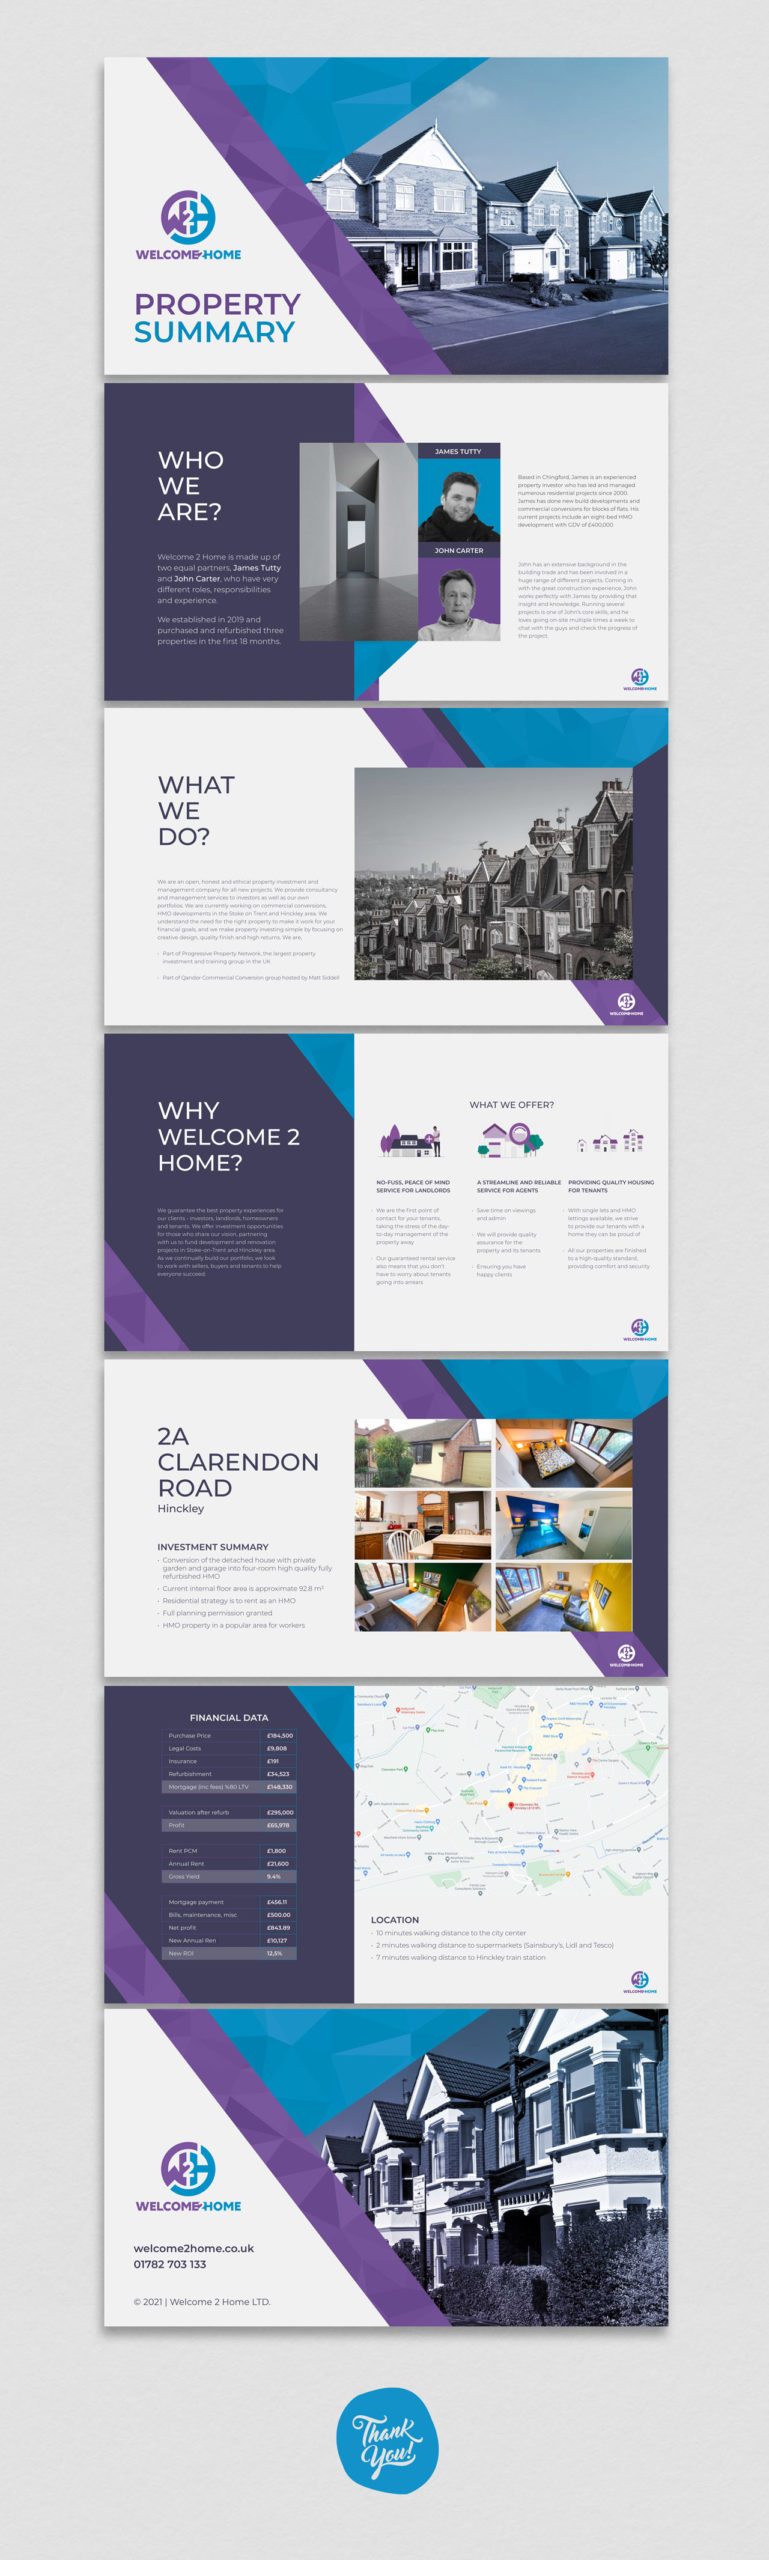 Digital Brochure designed by BONB Creative & Design